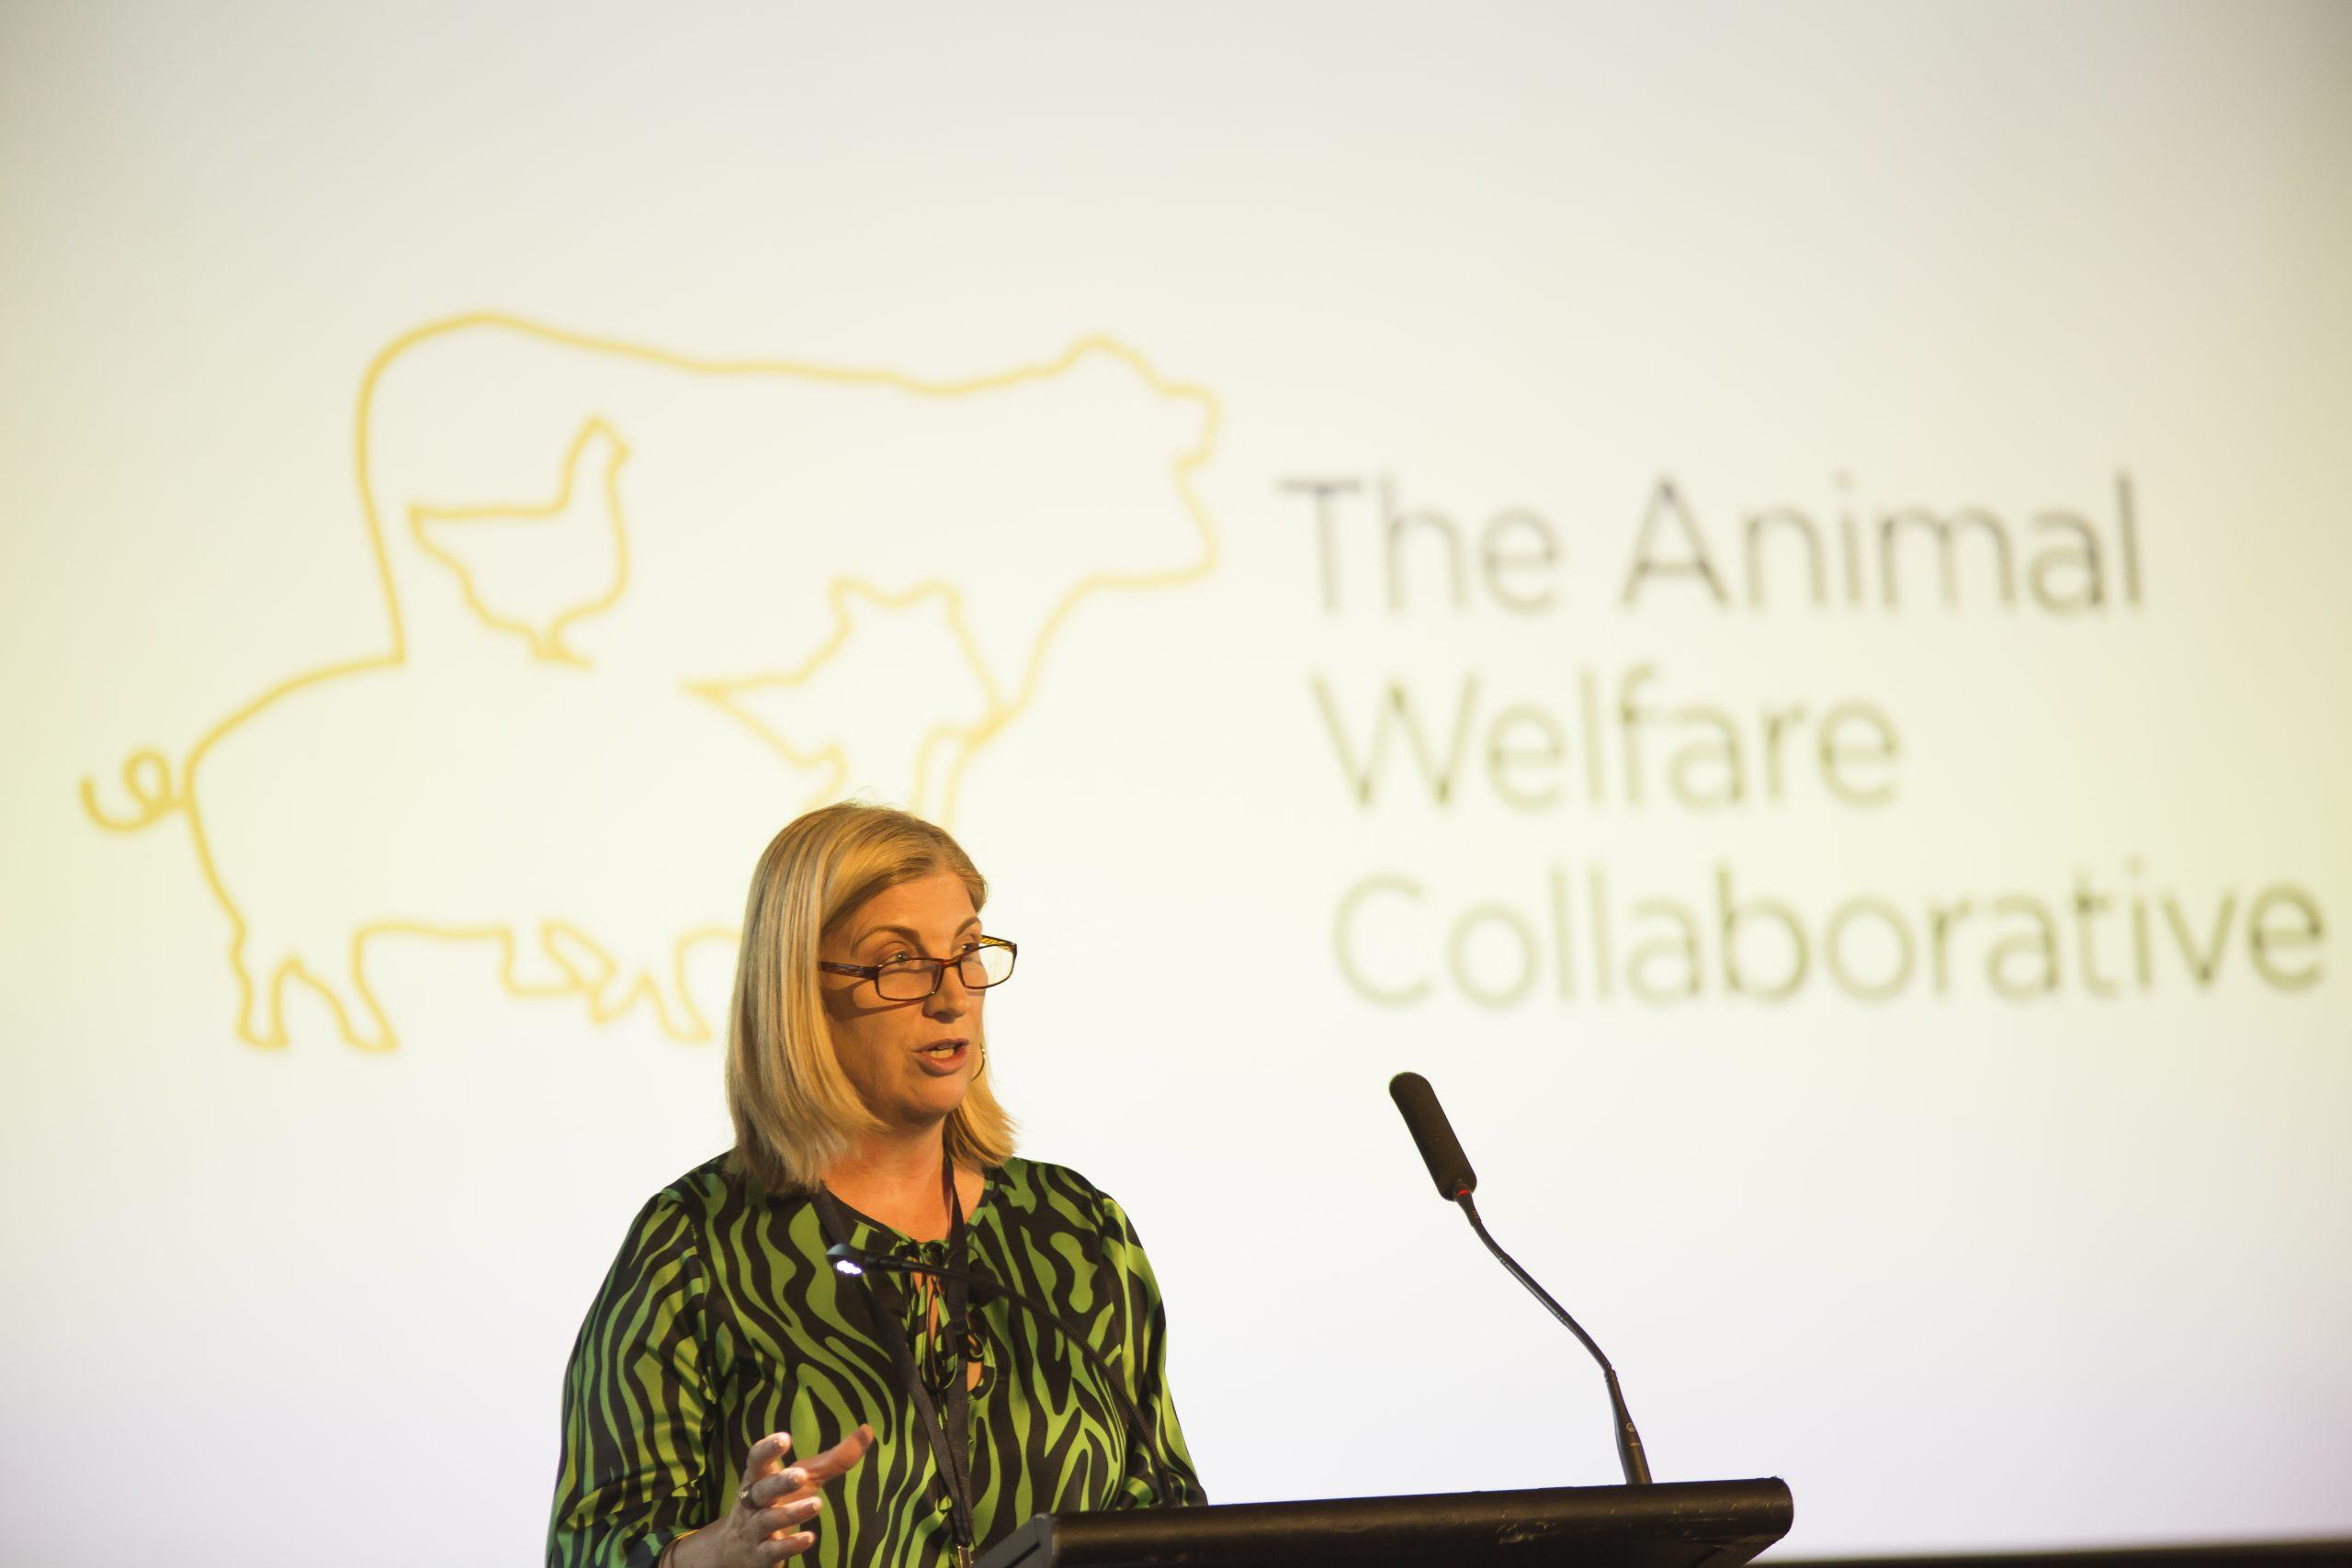 UQ DVCR Bronwyn Harch launches The Animal Welfare Collaborative